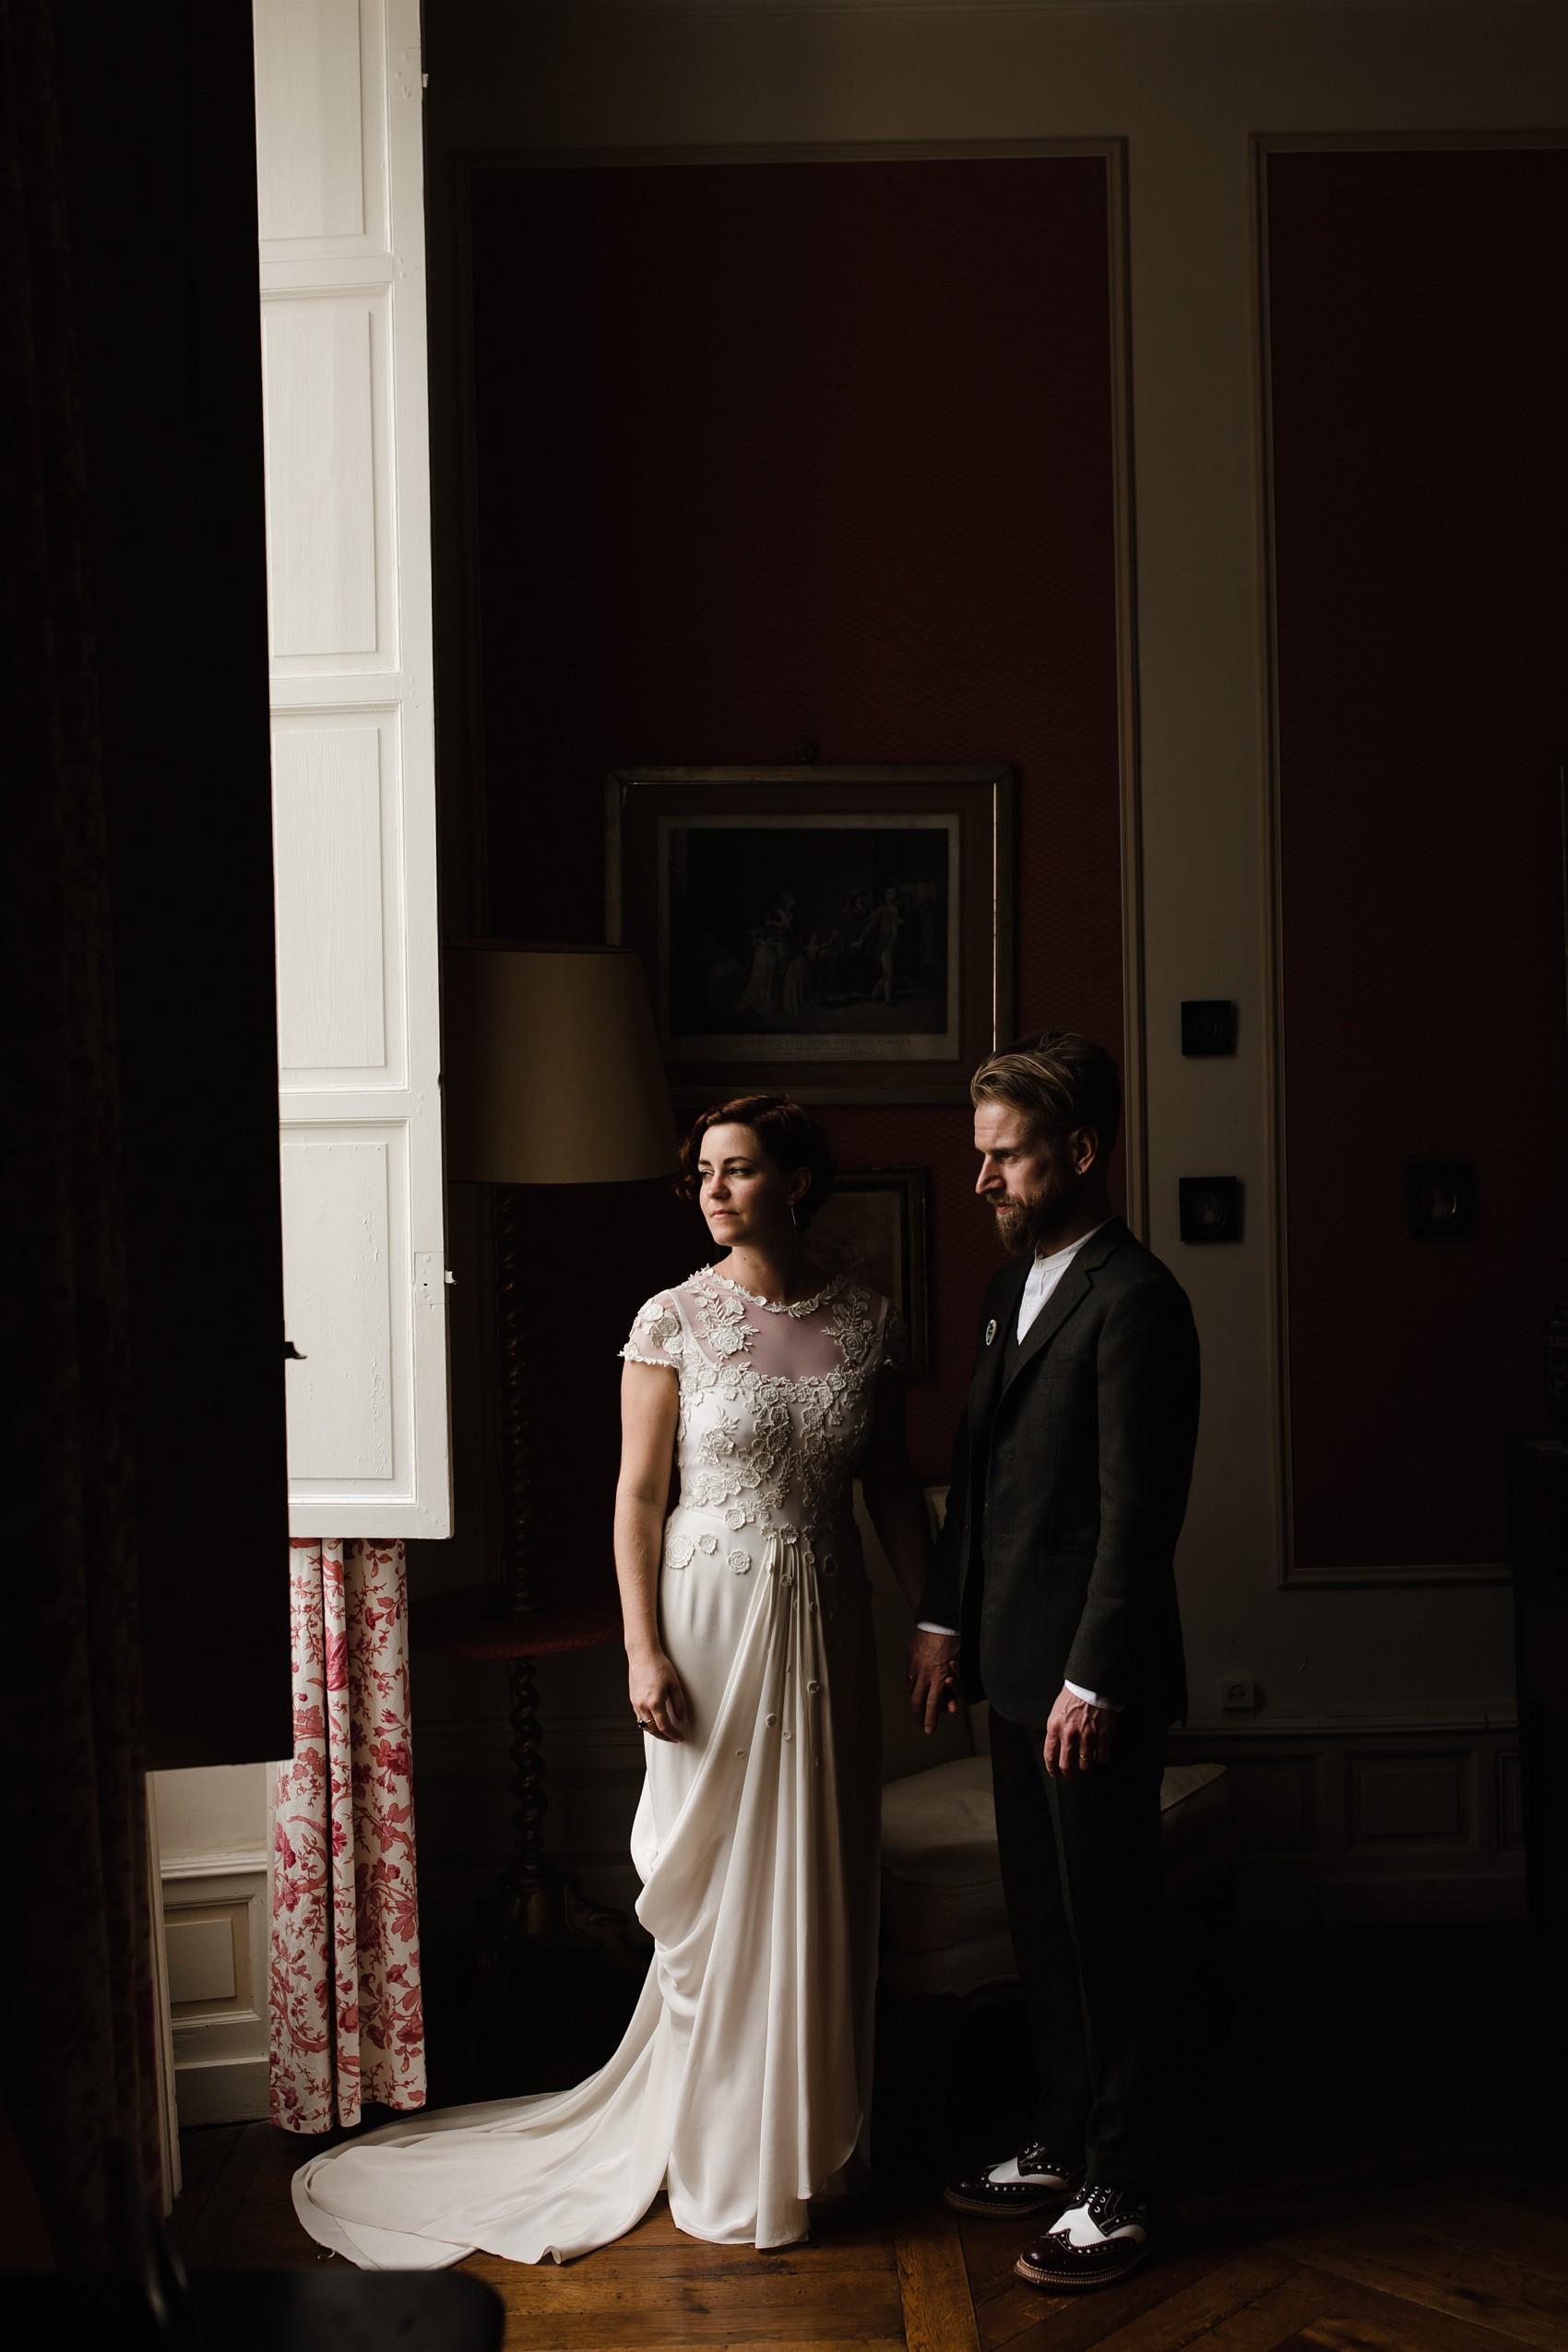 A Temperley London Dress Velvet Tweed Jewel Tones For A Joyful